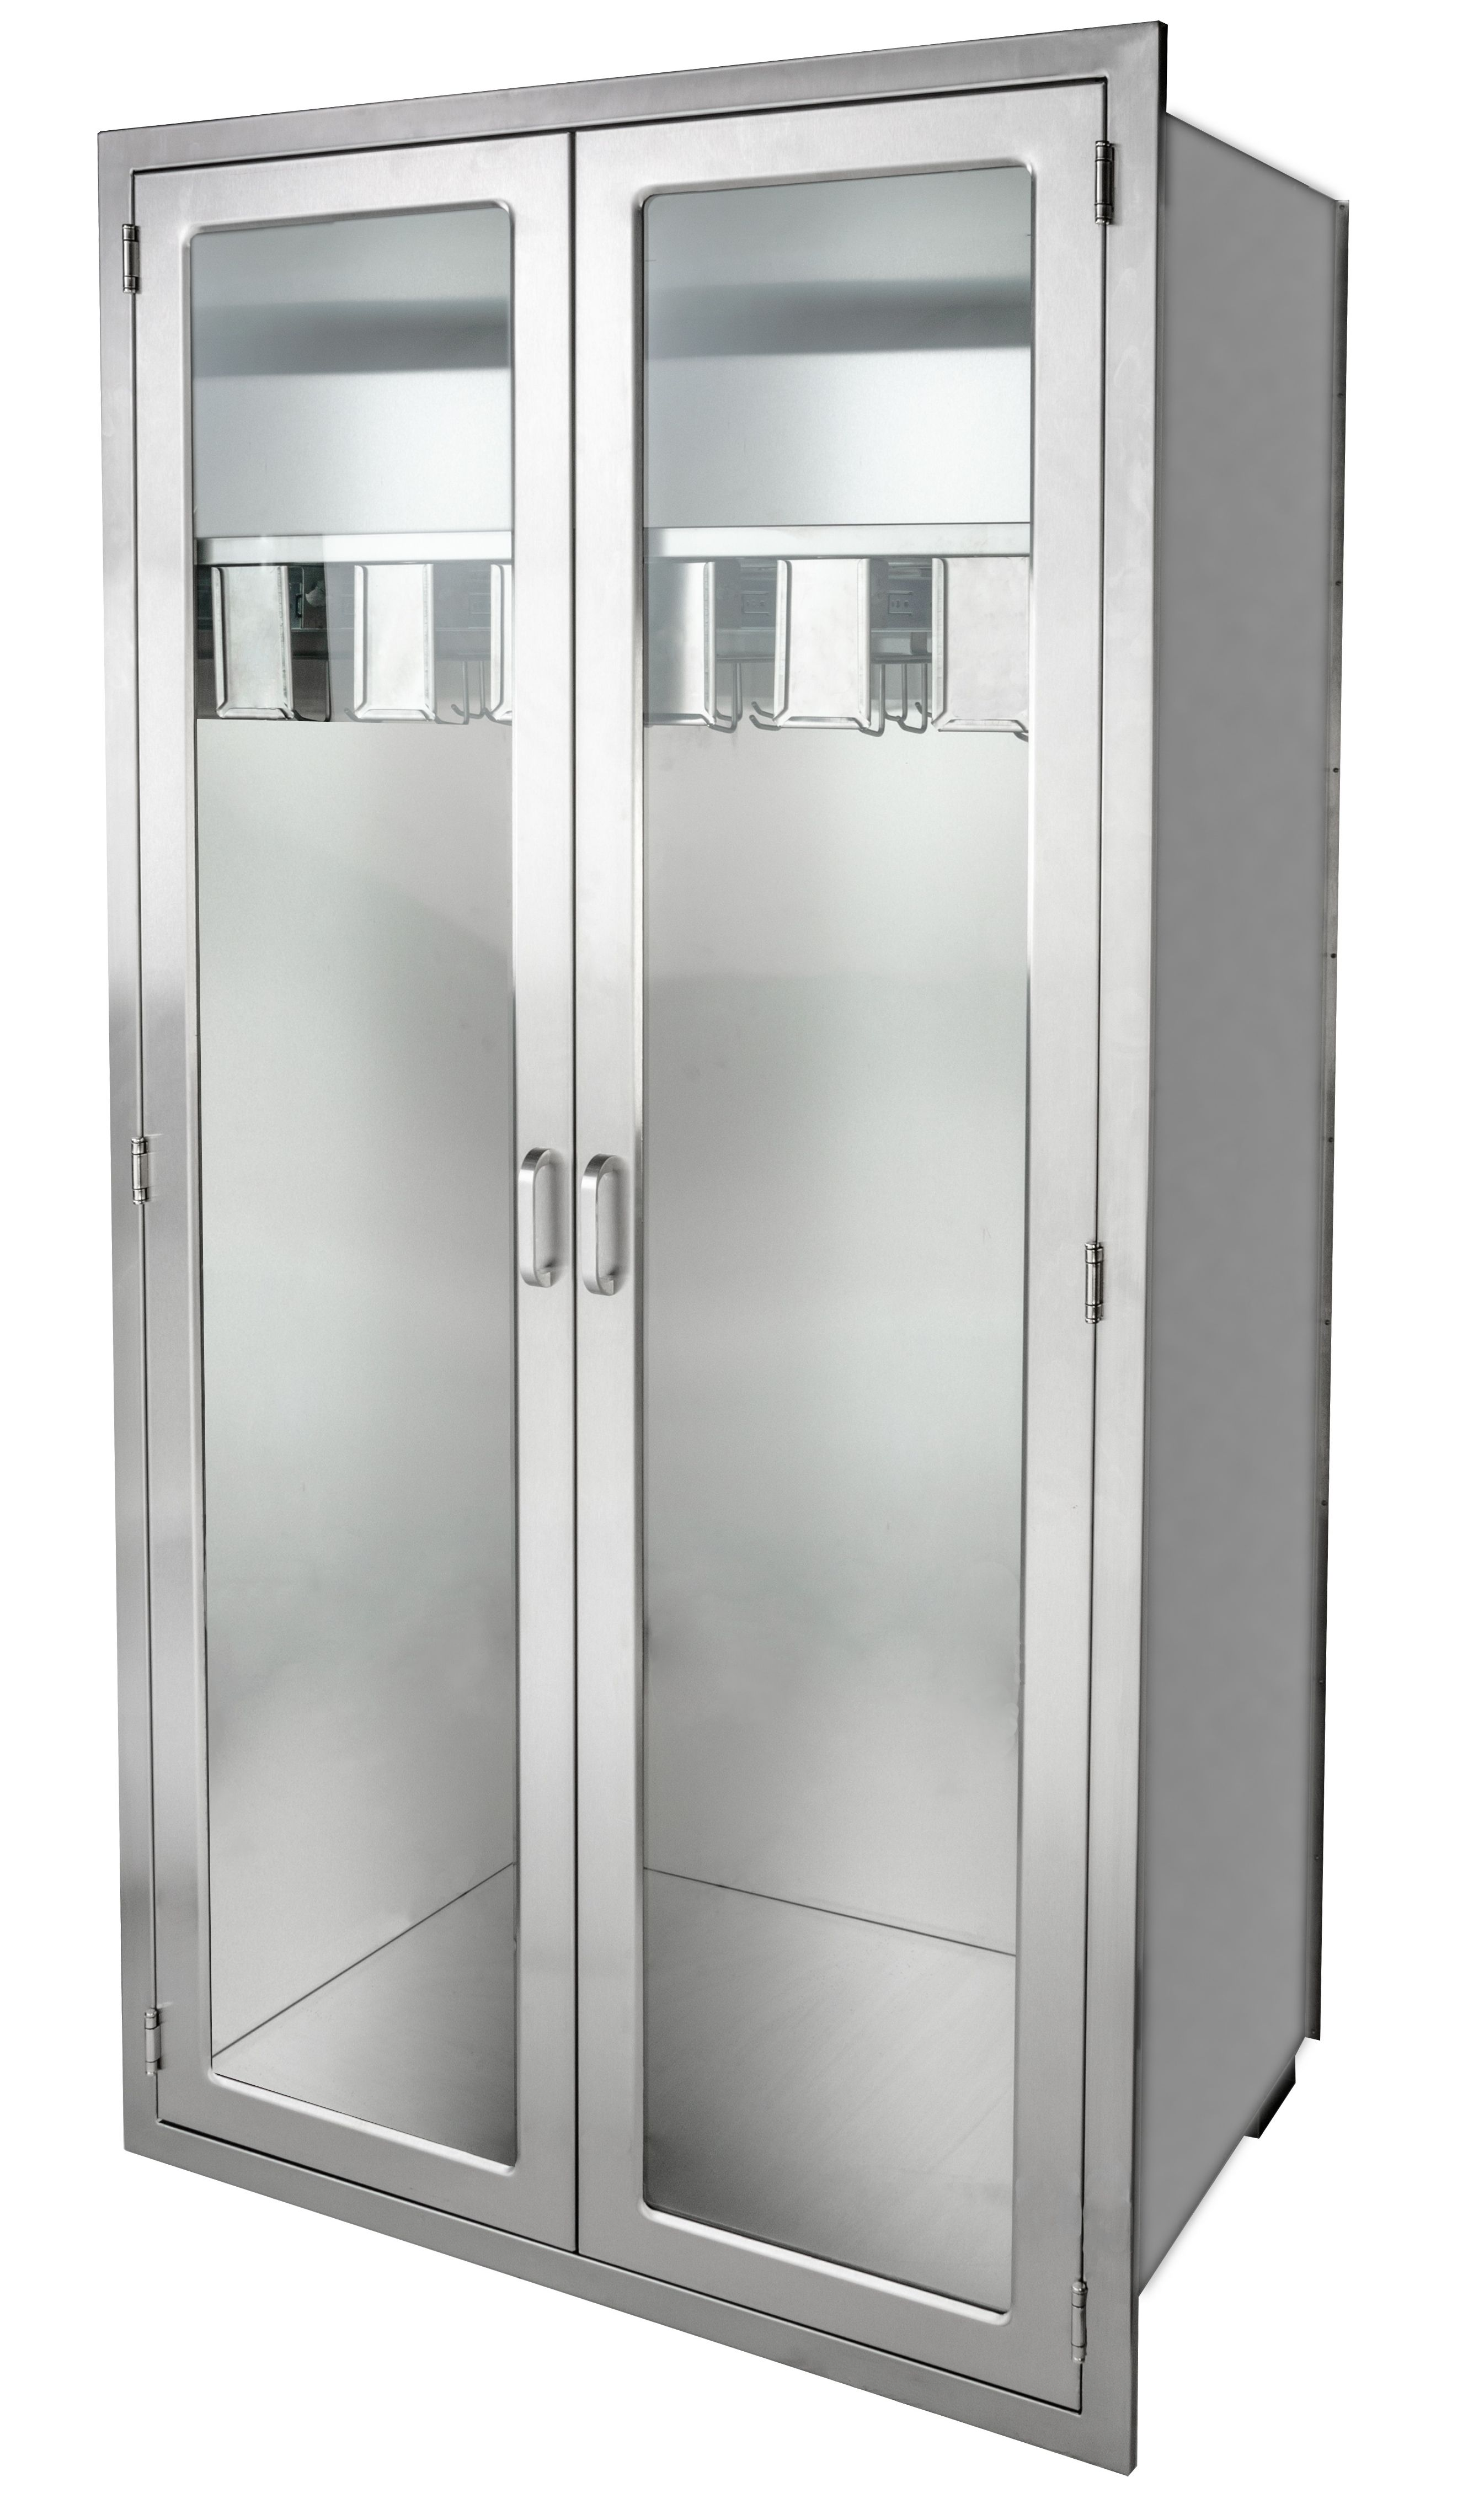 Stainless Steel Storage Cabinet With Glass Doors Garden Steel